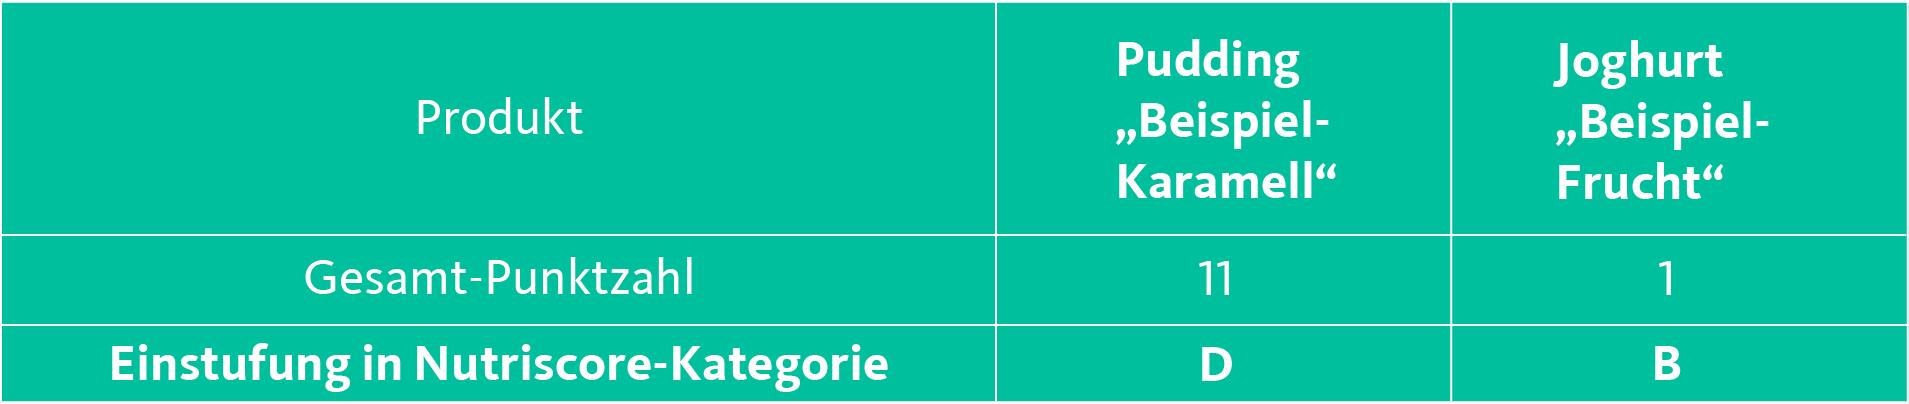 Tabelle 3 Nutriscore